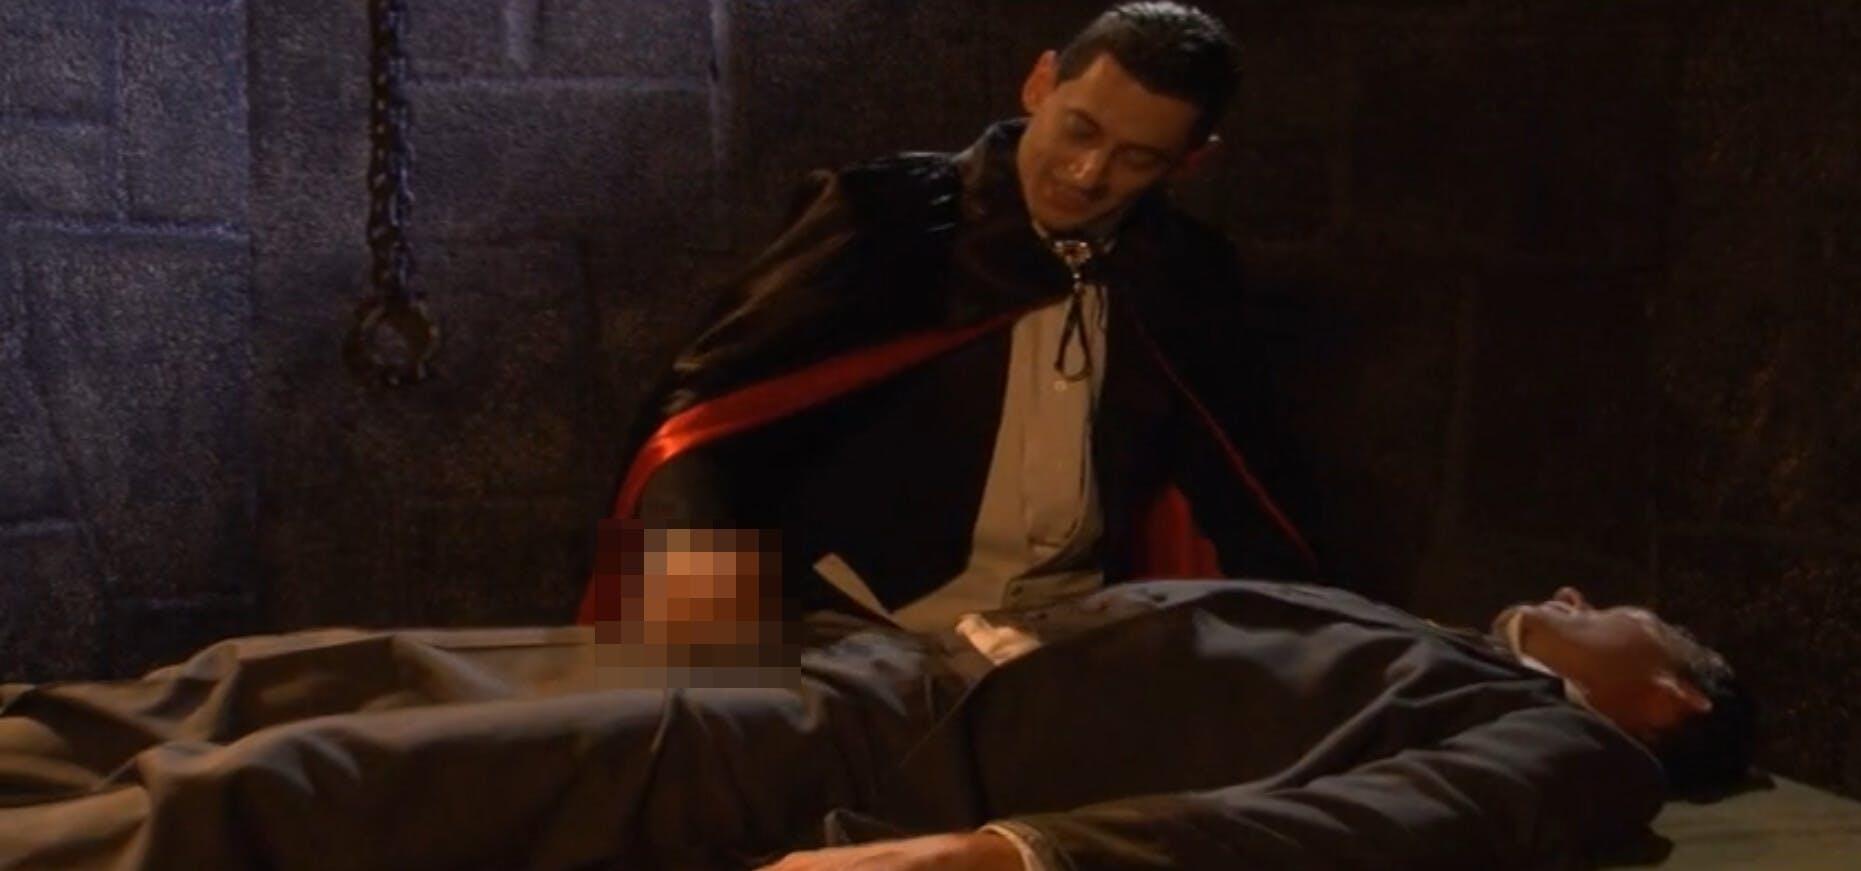 Best Gay Vampire Porn His Dracula